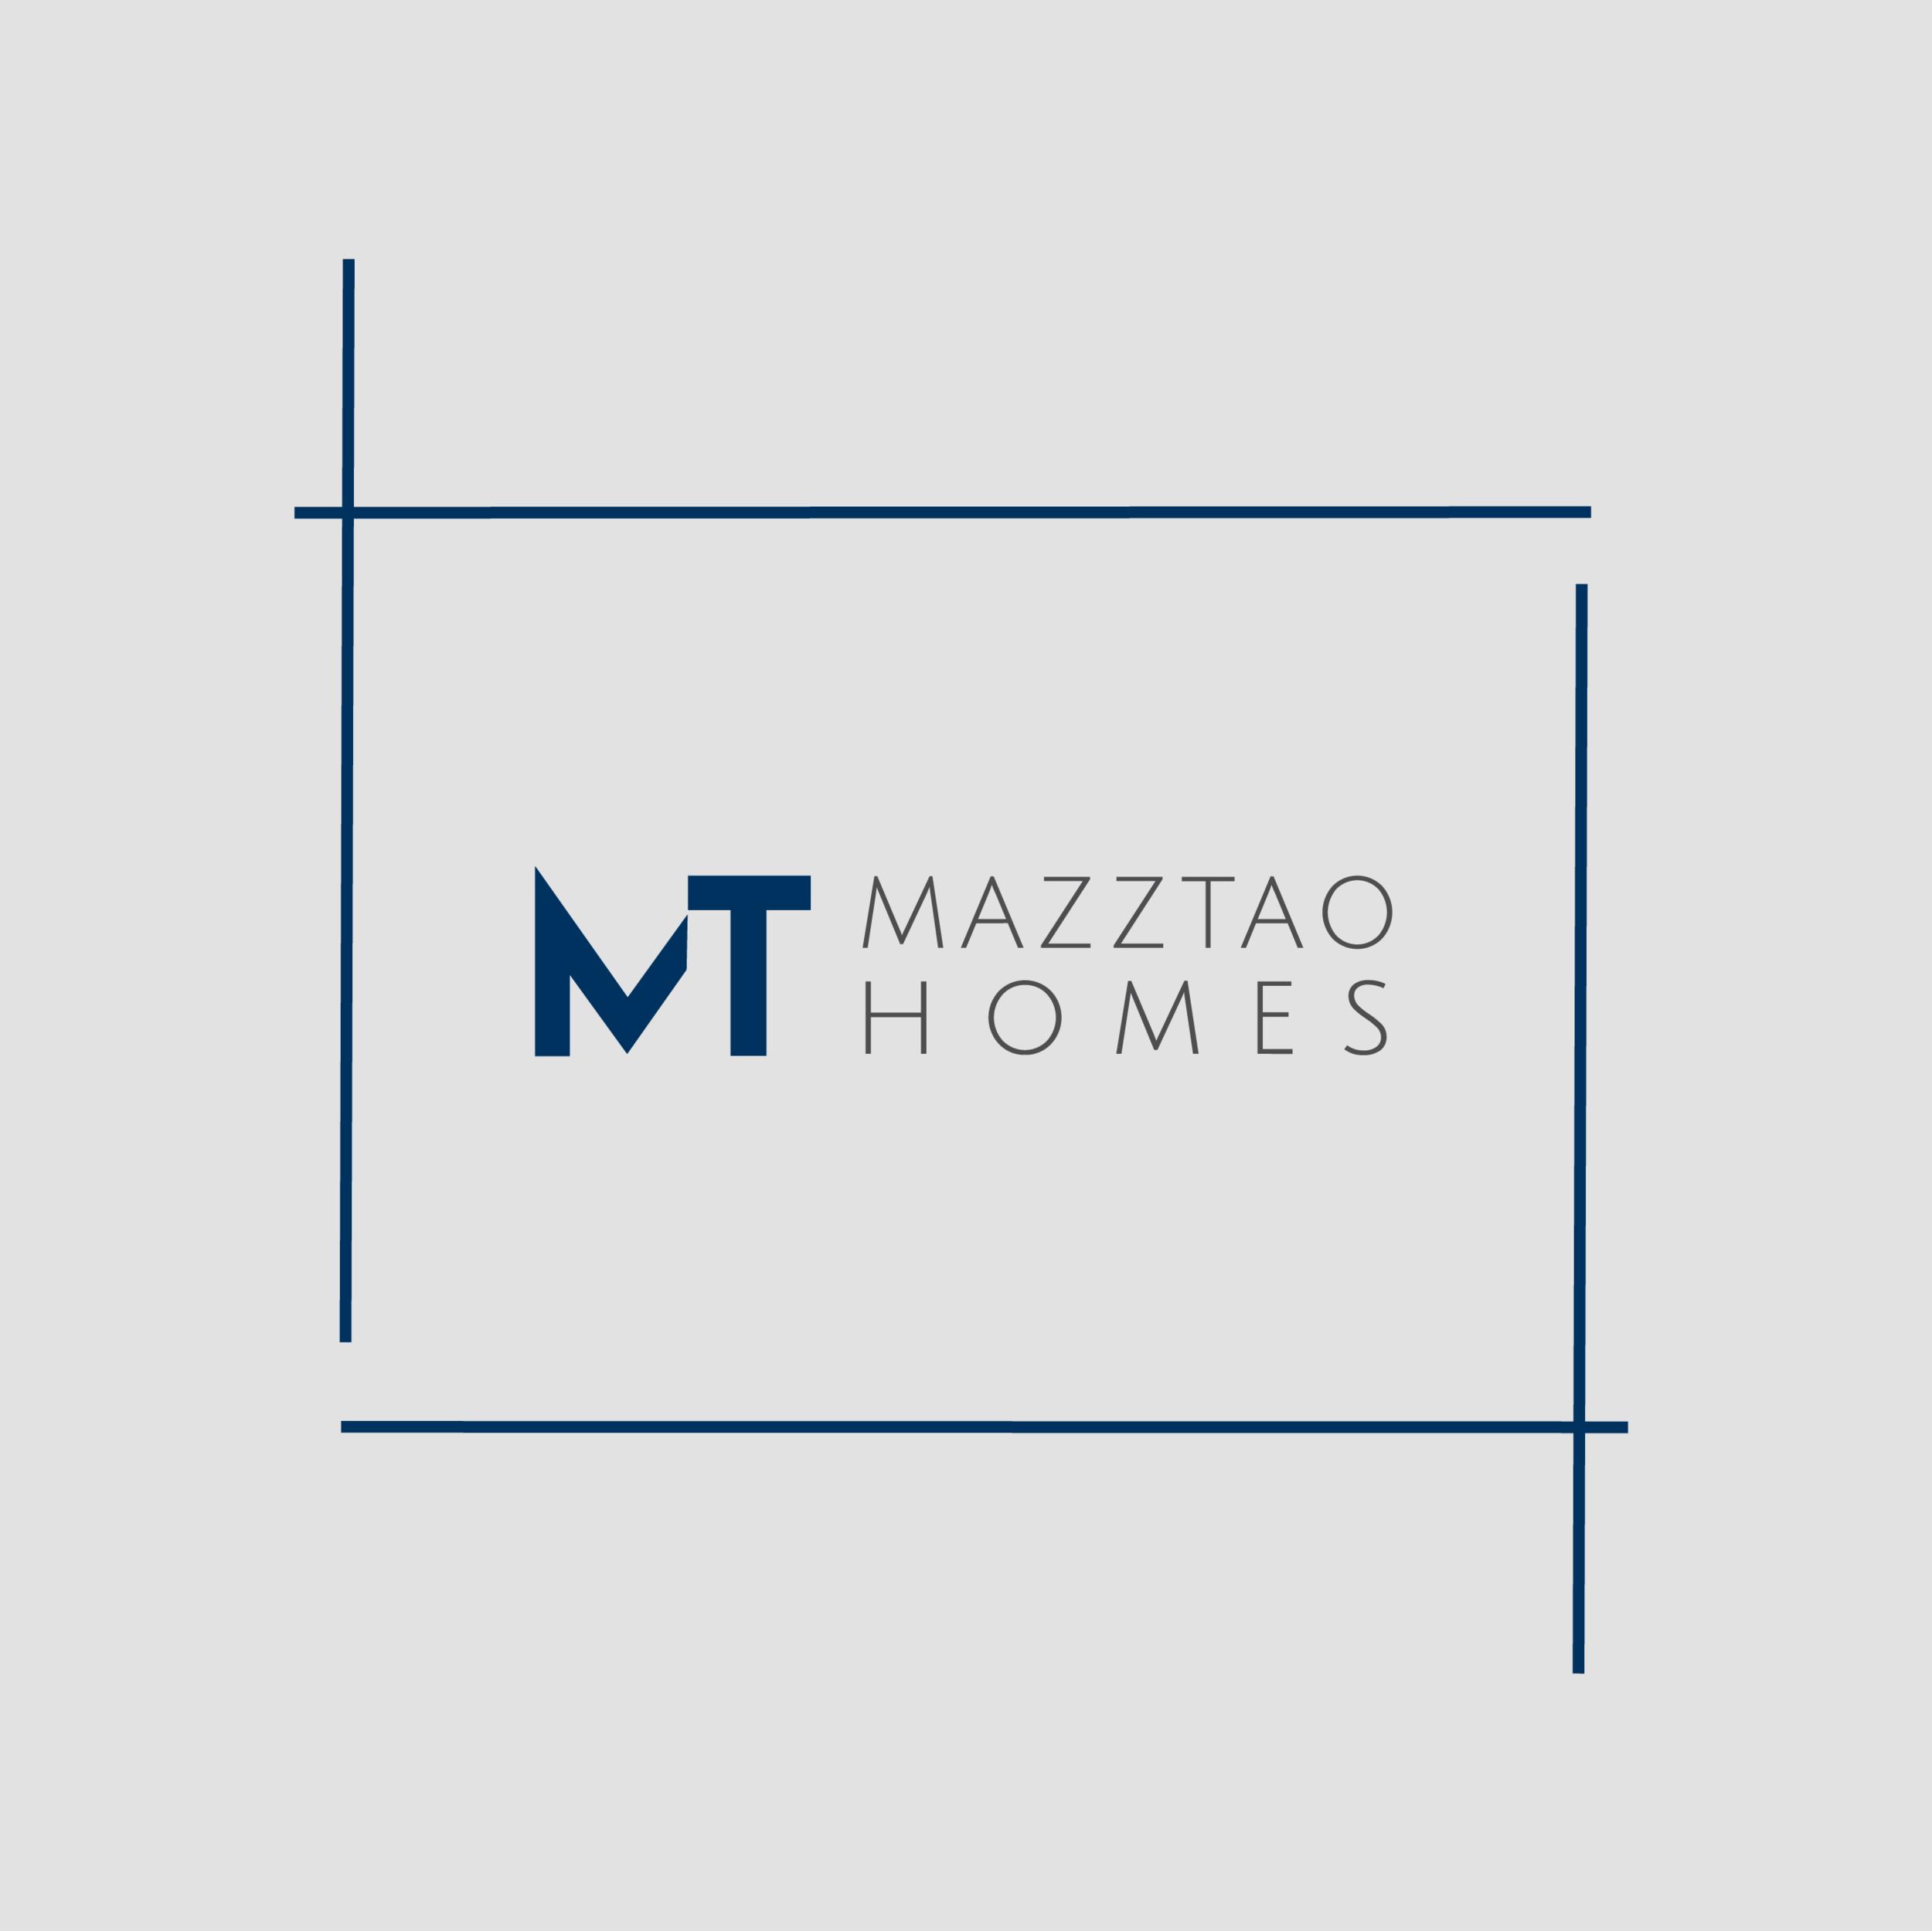 Mazztao Primary Insta_1.png